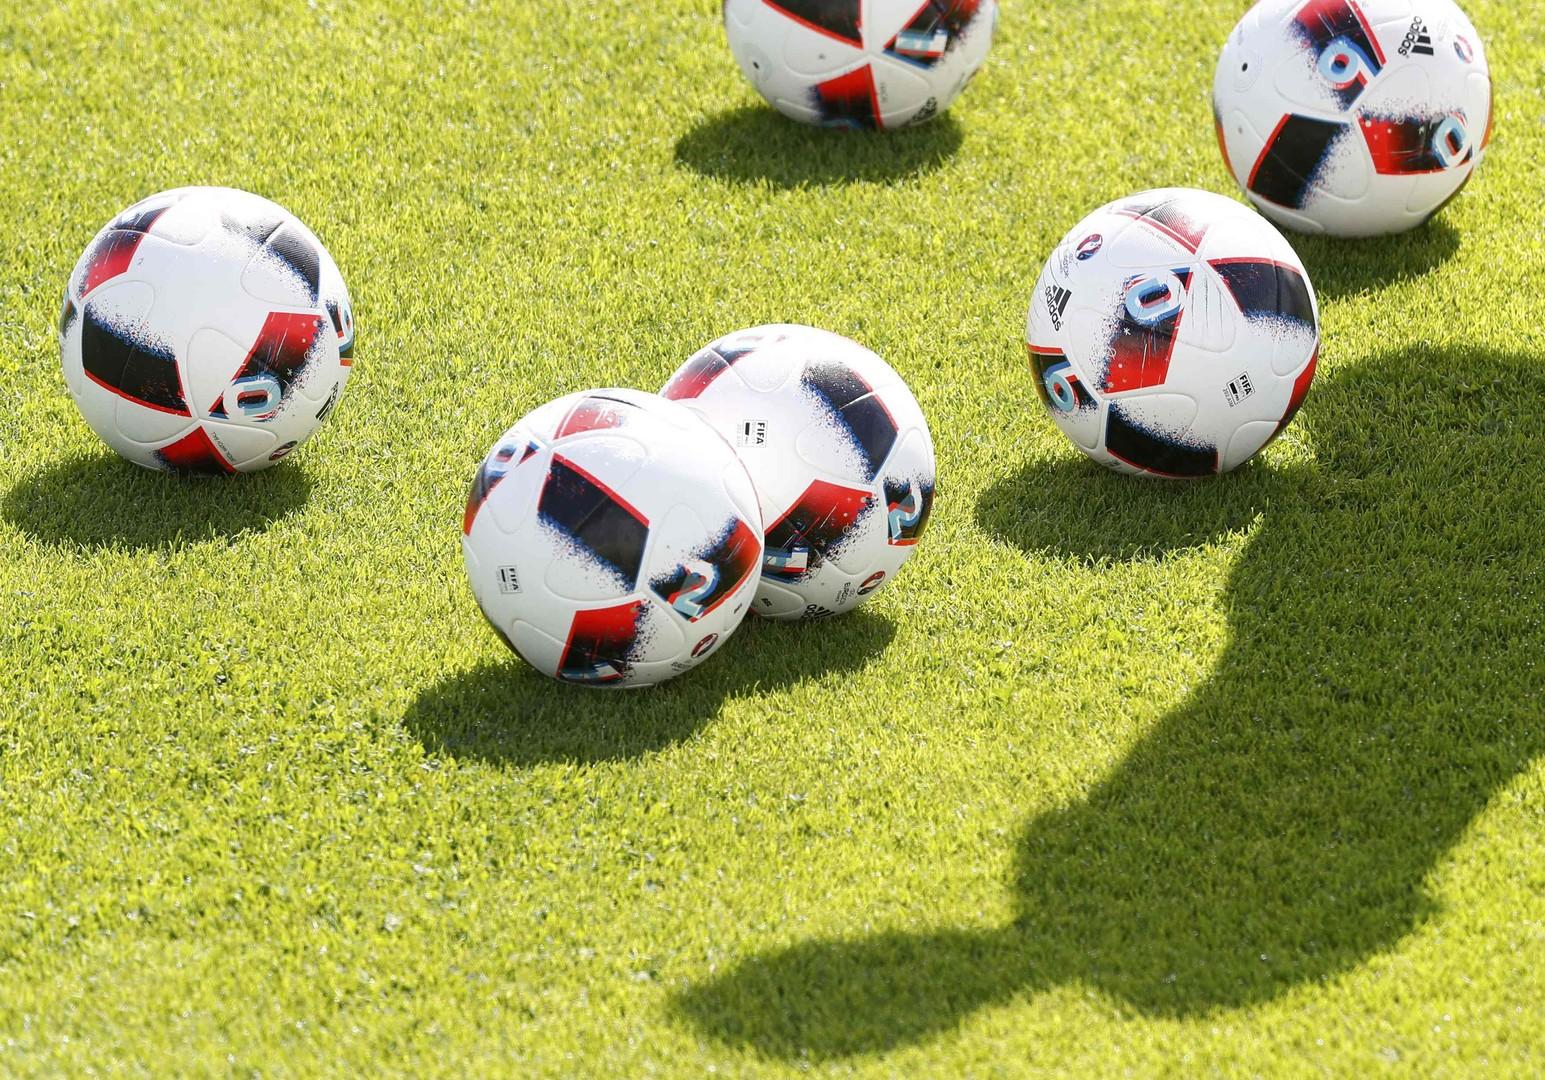 Евро-2016: анонс первого матча четвертьфинала